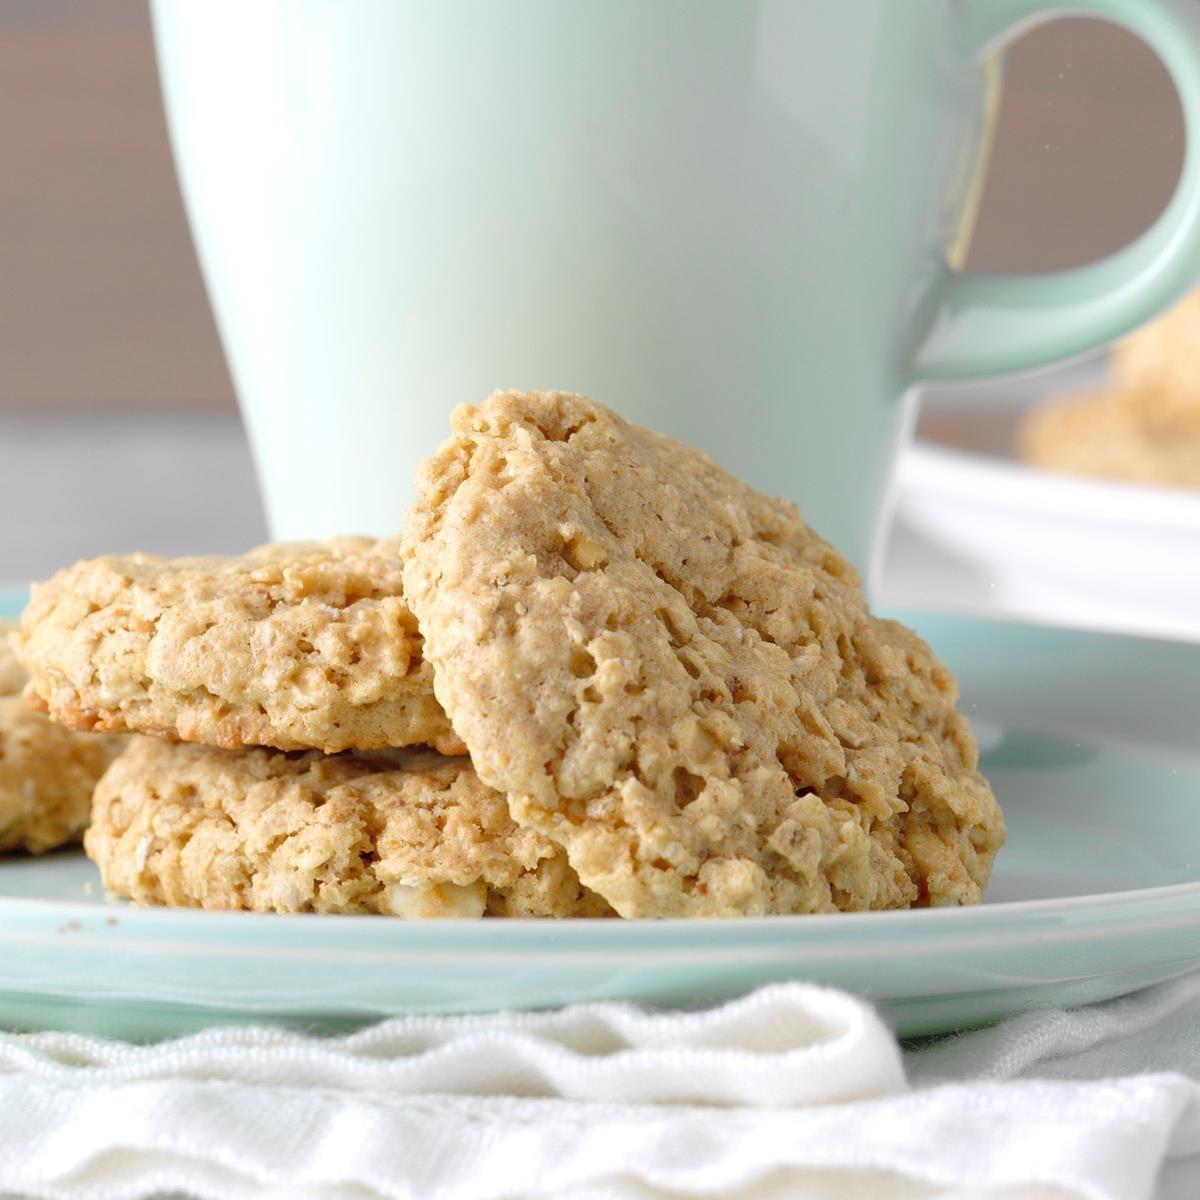 Easy Peanut Butter Oatmeal Cookies Exps Diyd19 44945 B05 01 2b 12